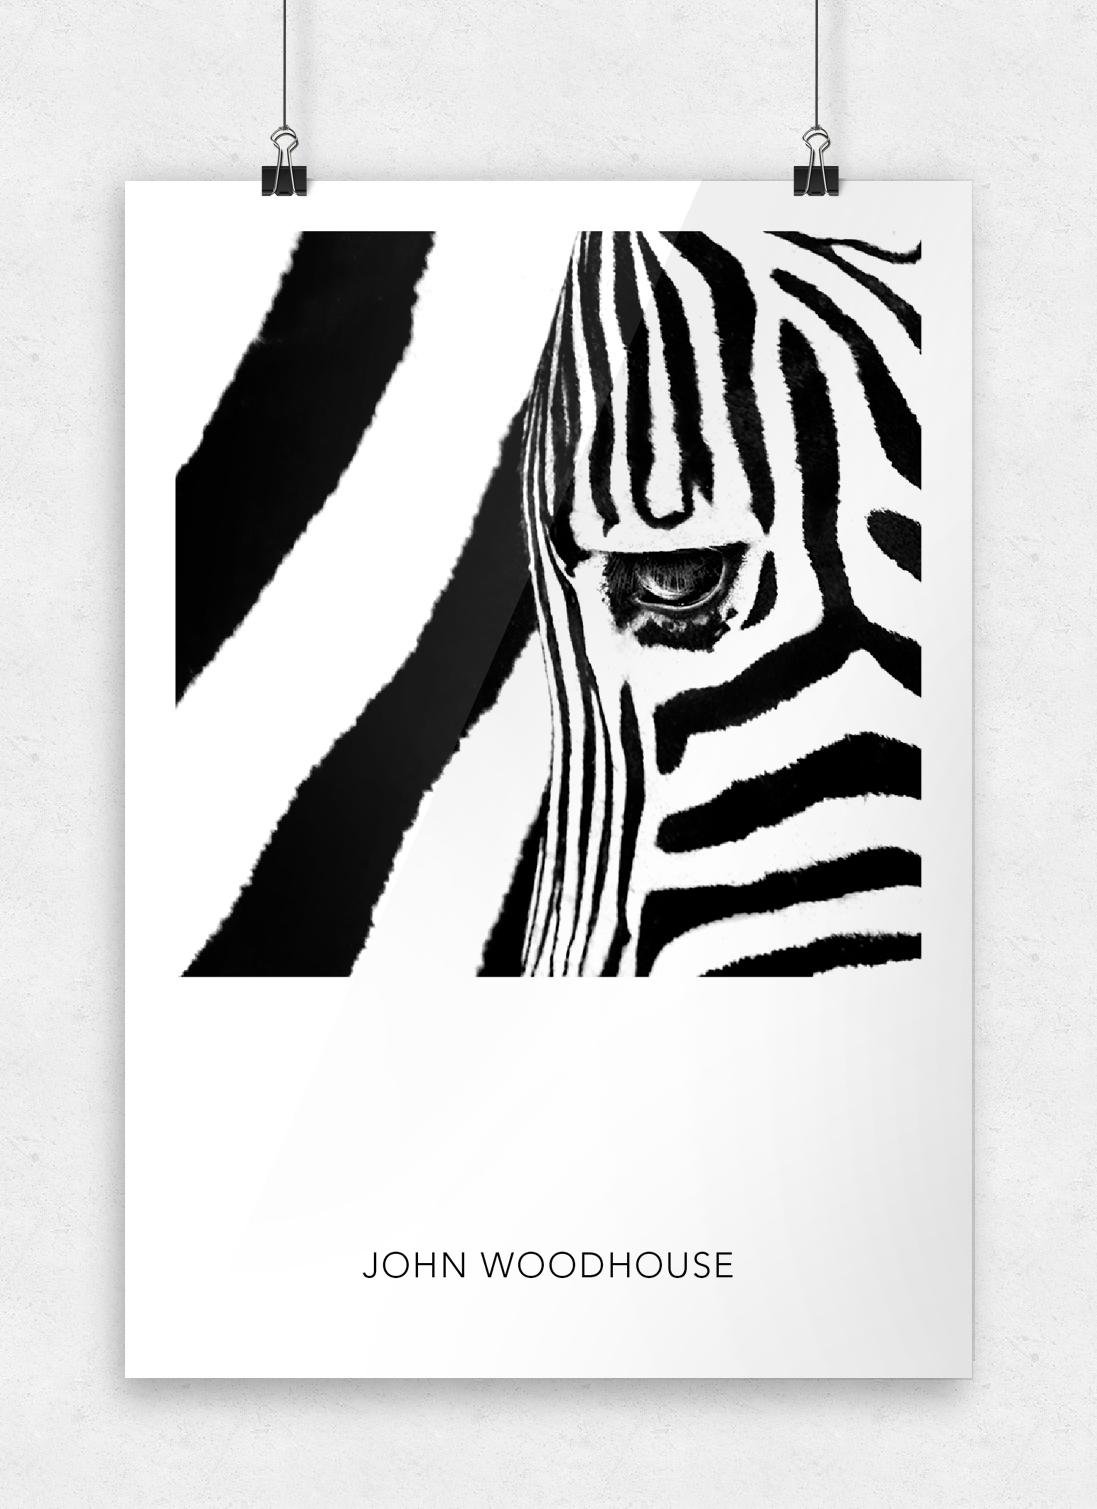 JW-Posters-Template_06.jpg